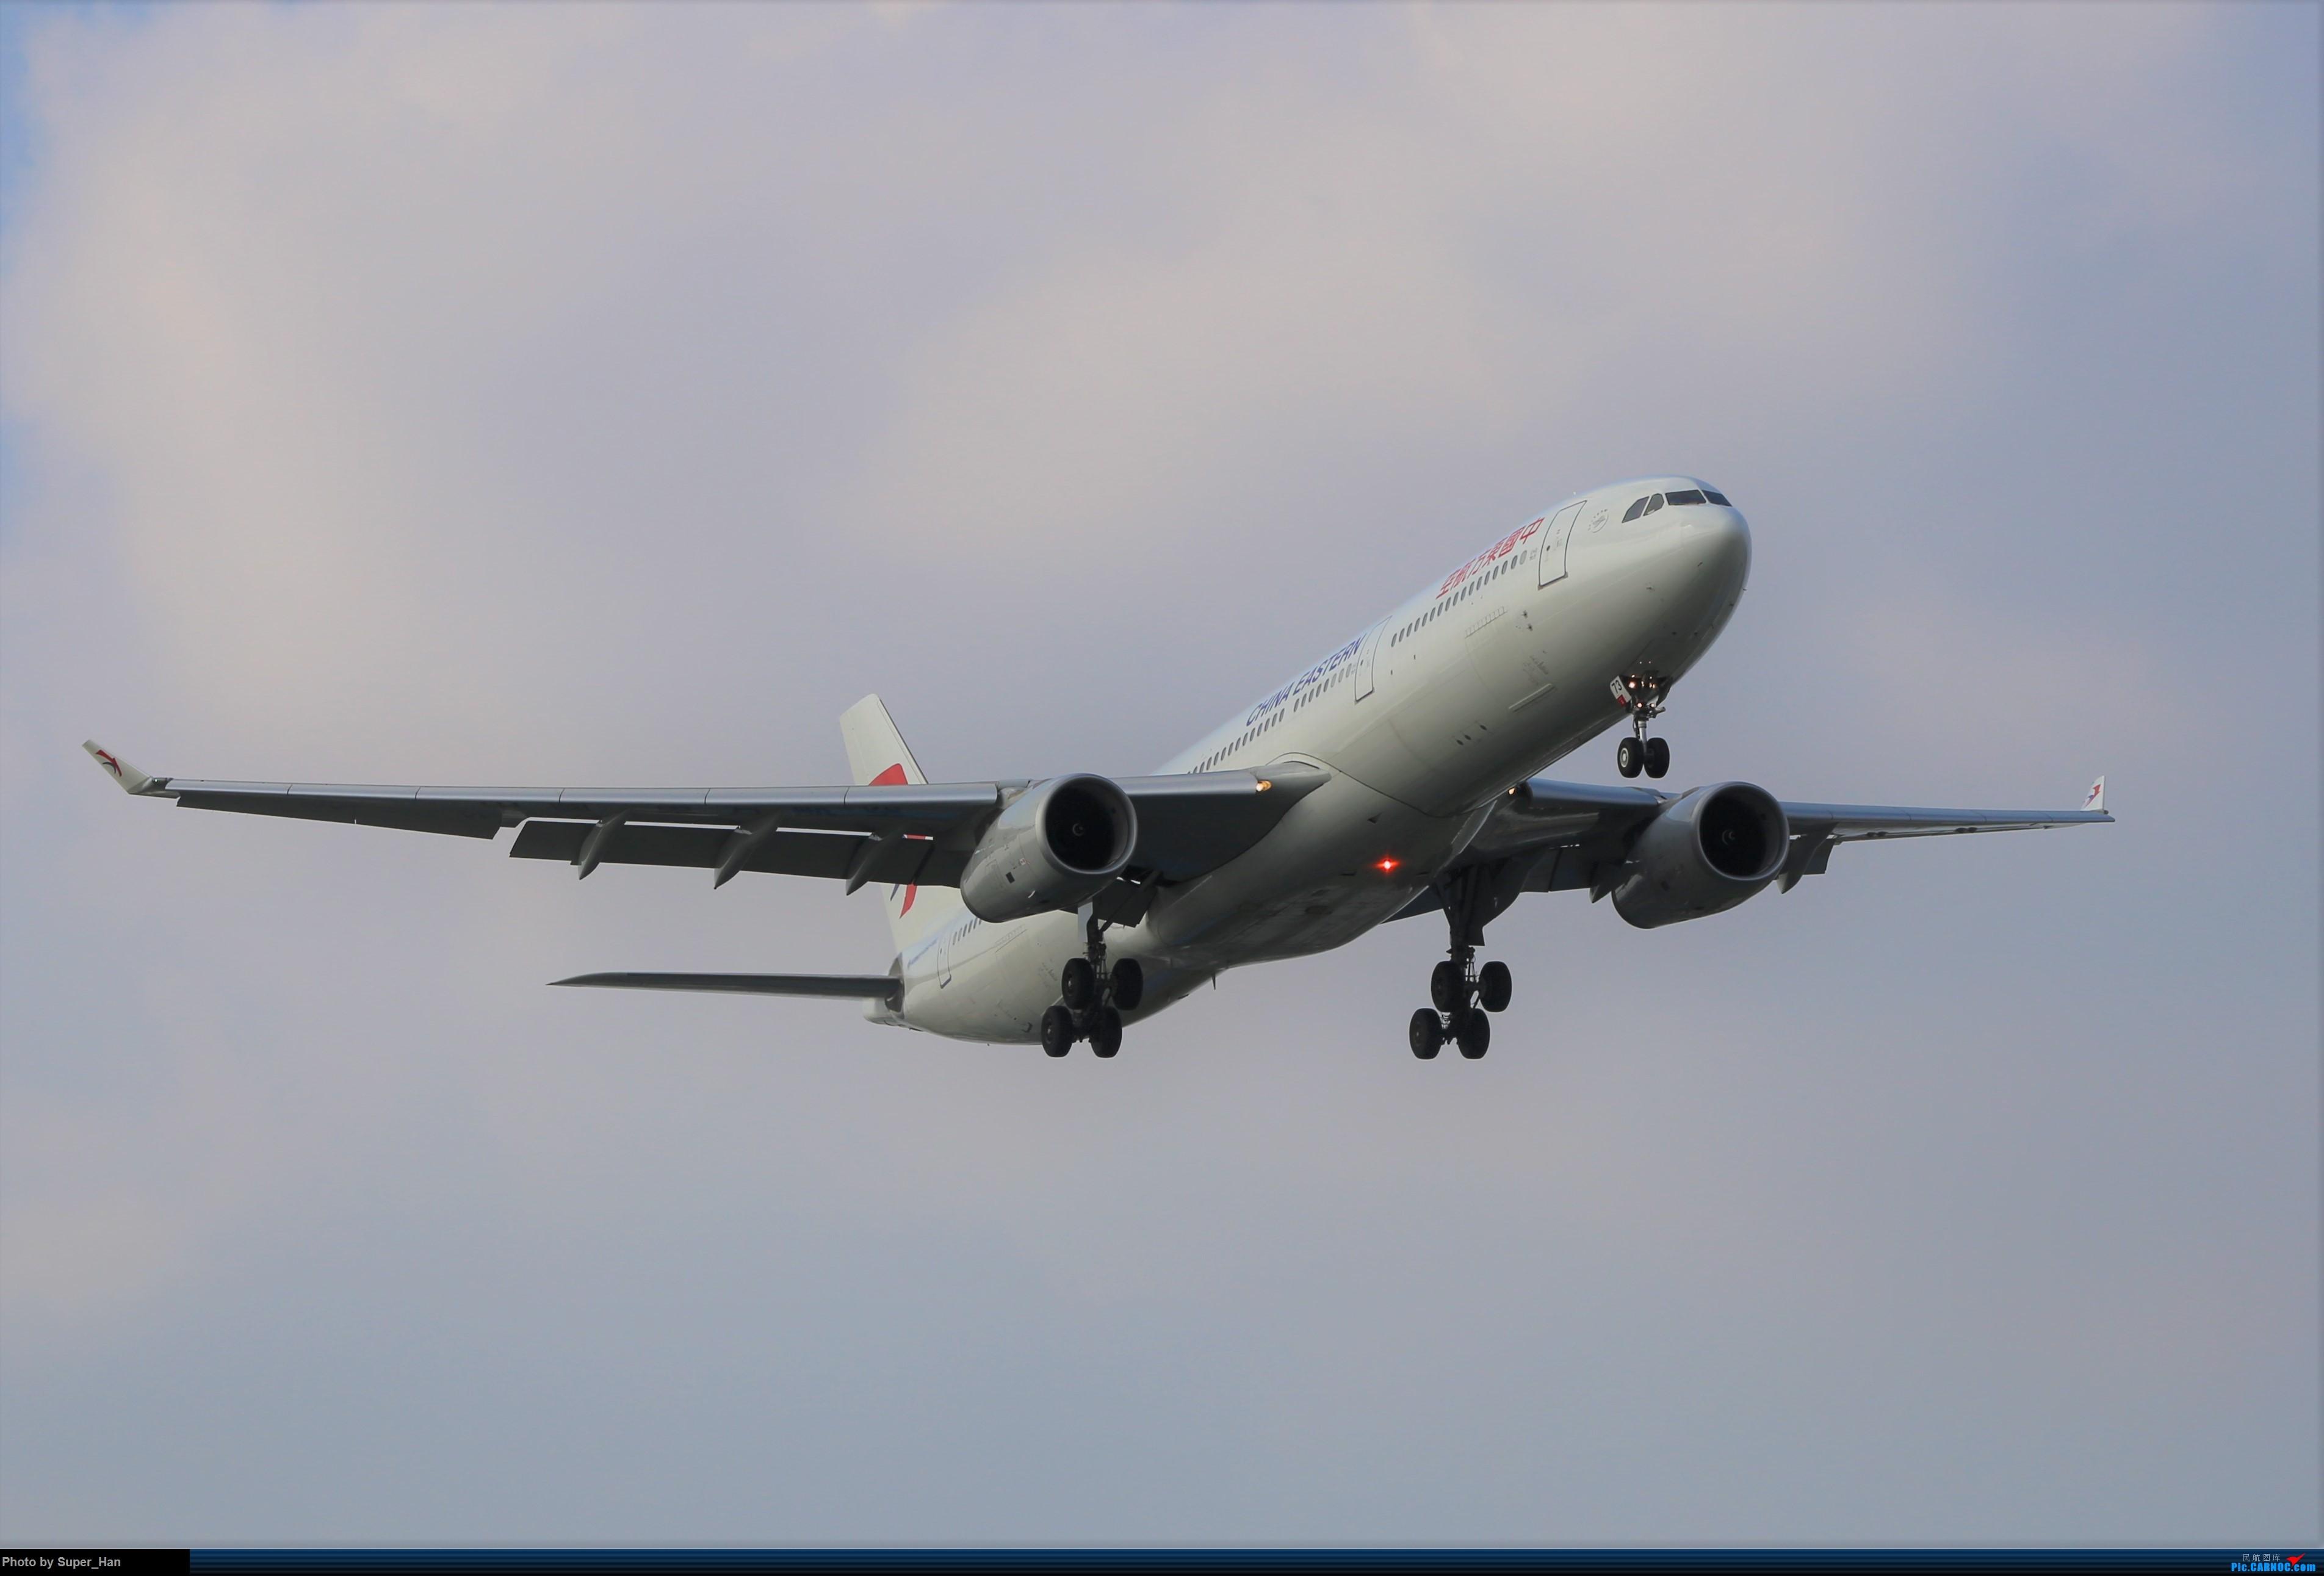 Re:[原创]0715去虹桥说走就走【最多的330篇】 AIRBUS A330-300 B-1073 中国上海虹桥国际机场